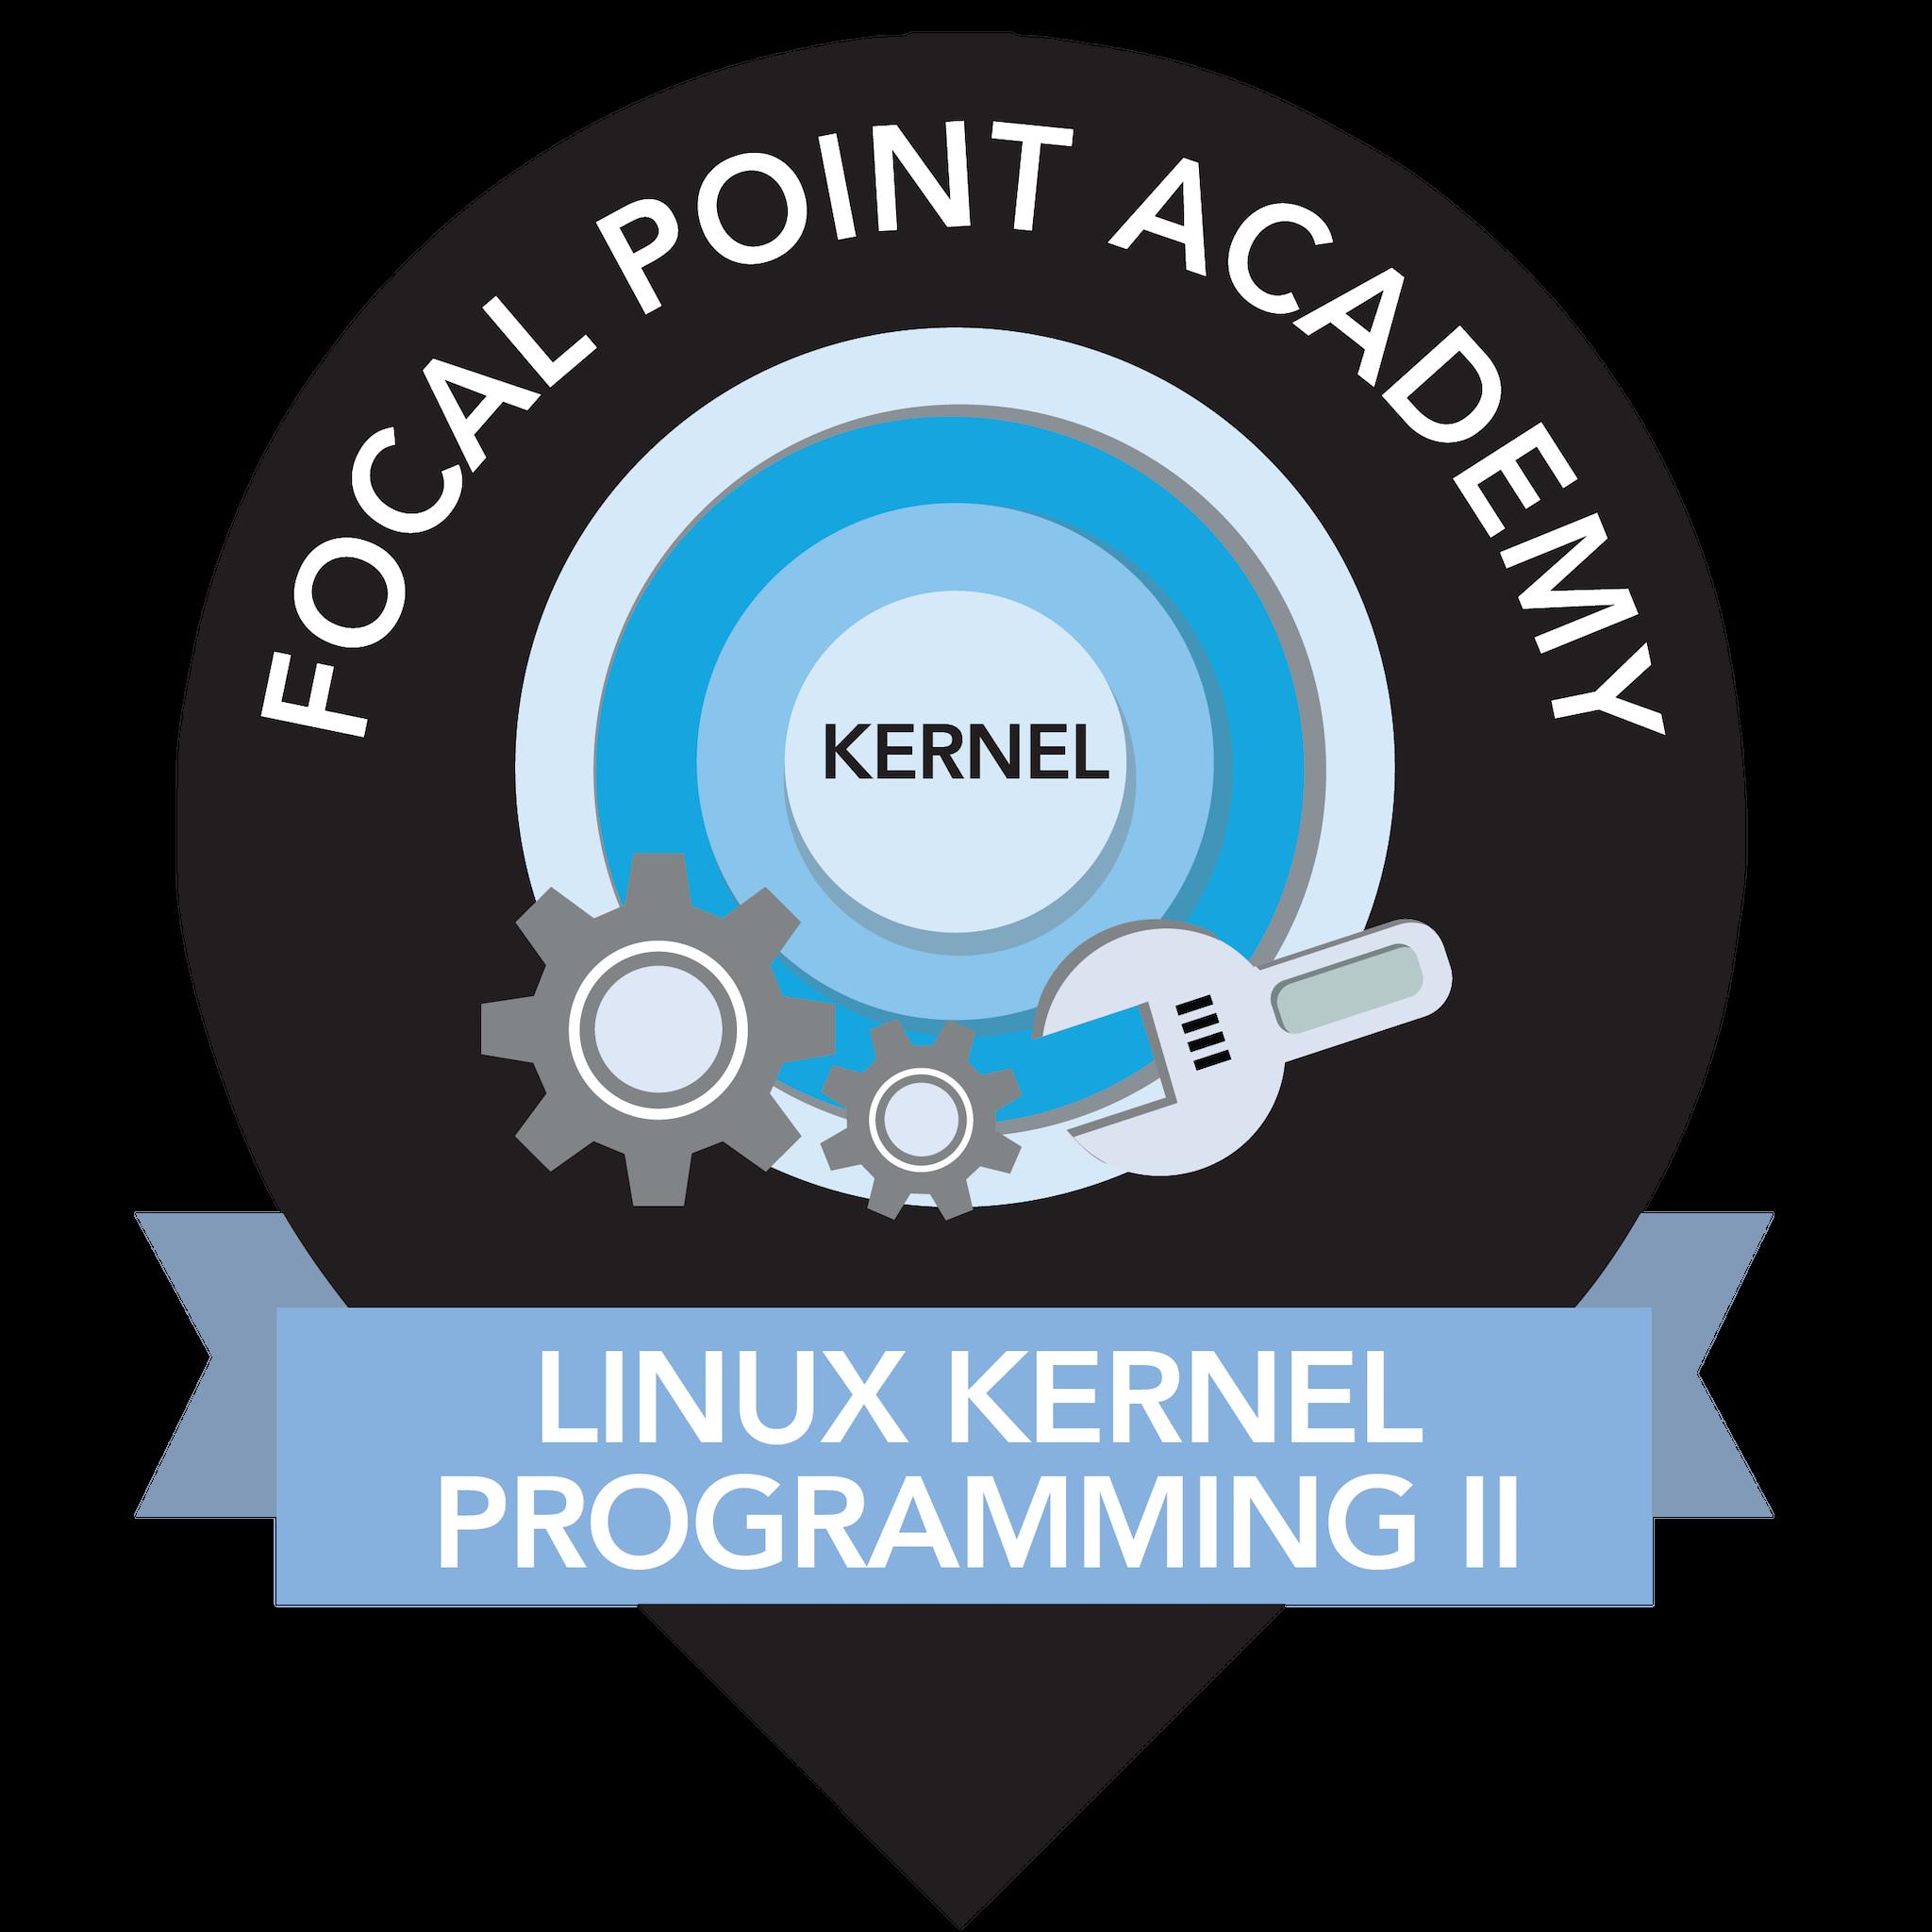 Linux Kernel Programming II